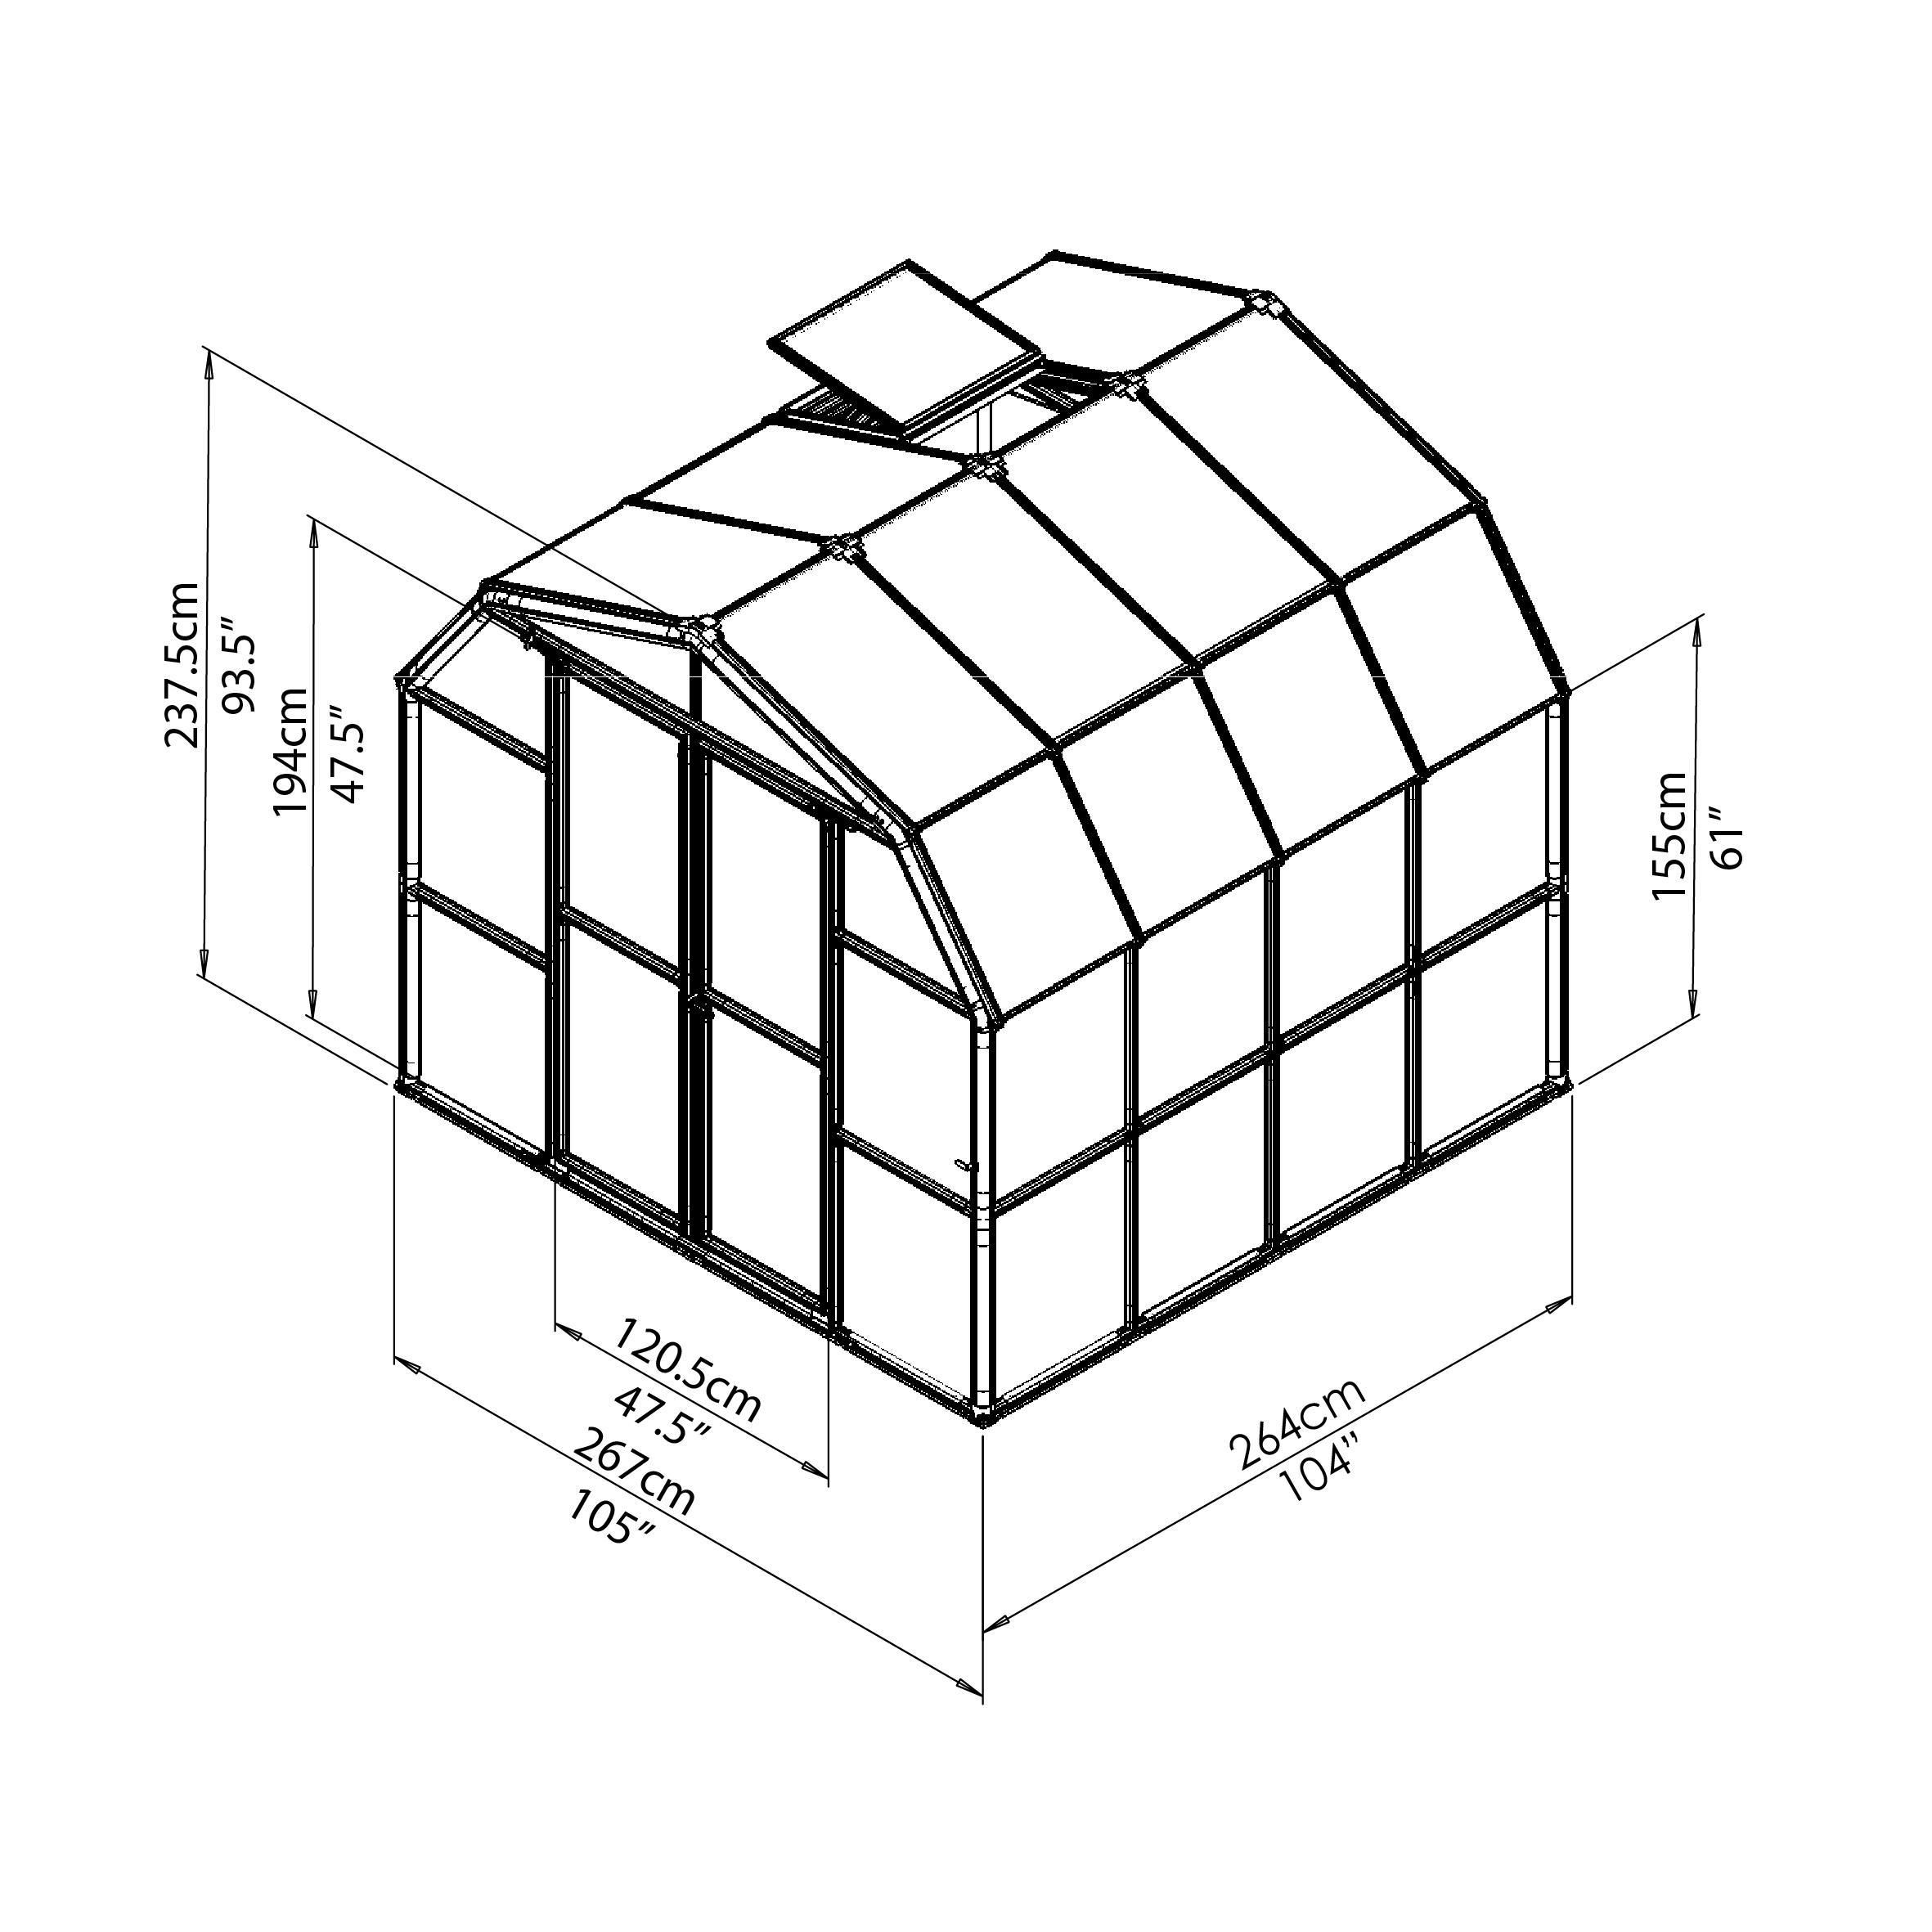 rion-greenhouses-grandgardener-8x8-drawing-isoview.jpg